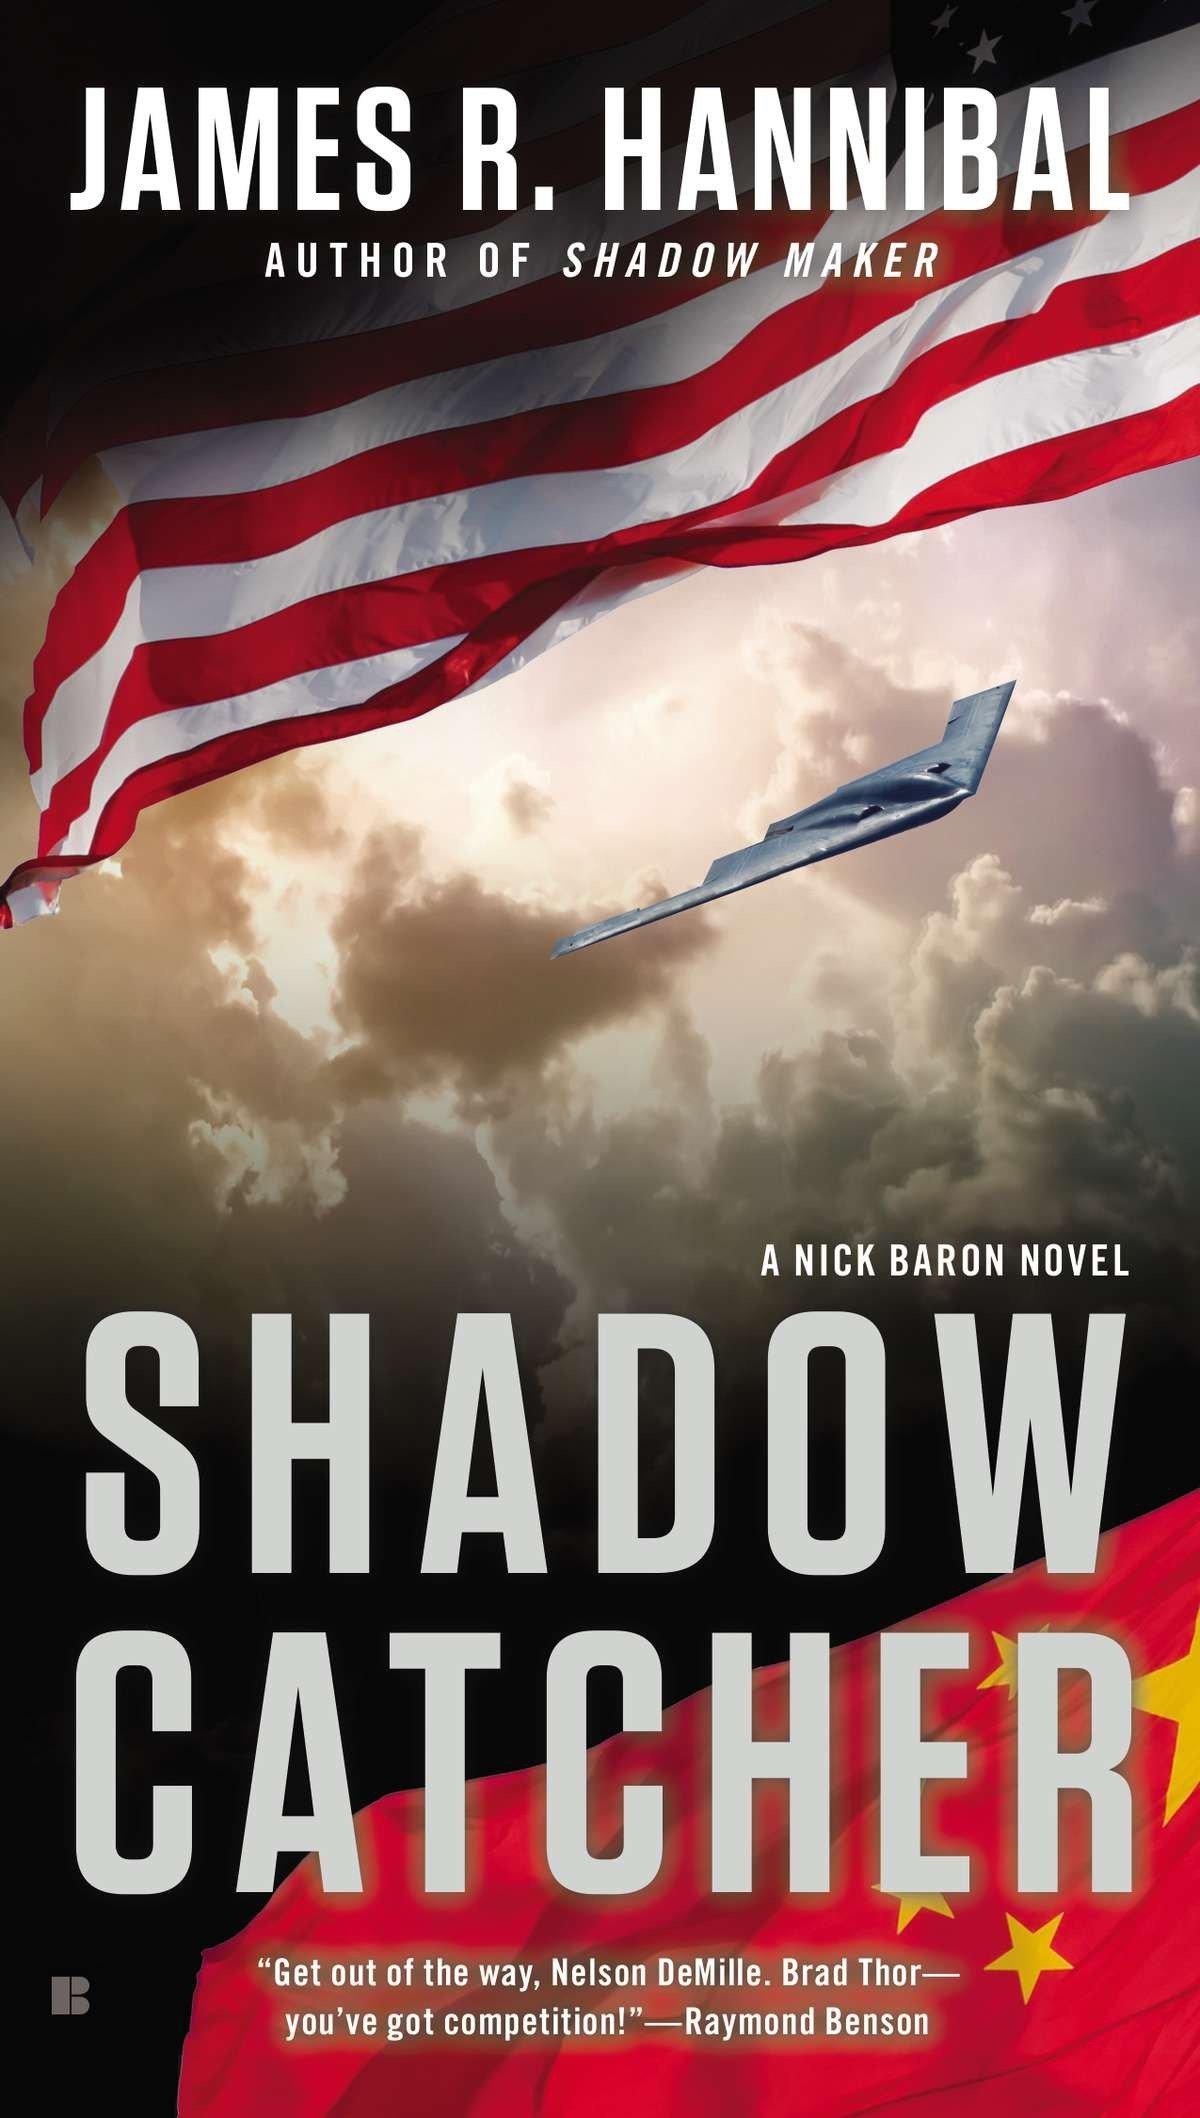 Amazon.com: Shadow Catcher (Nick Baron Series) (9780425266885): James R.  Hannibal: Books